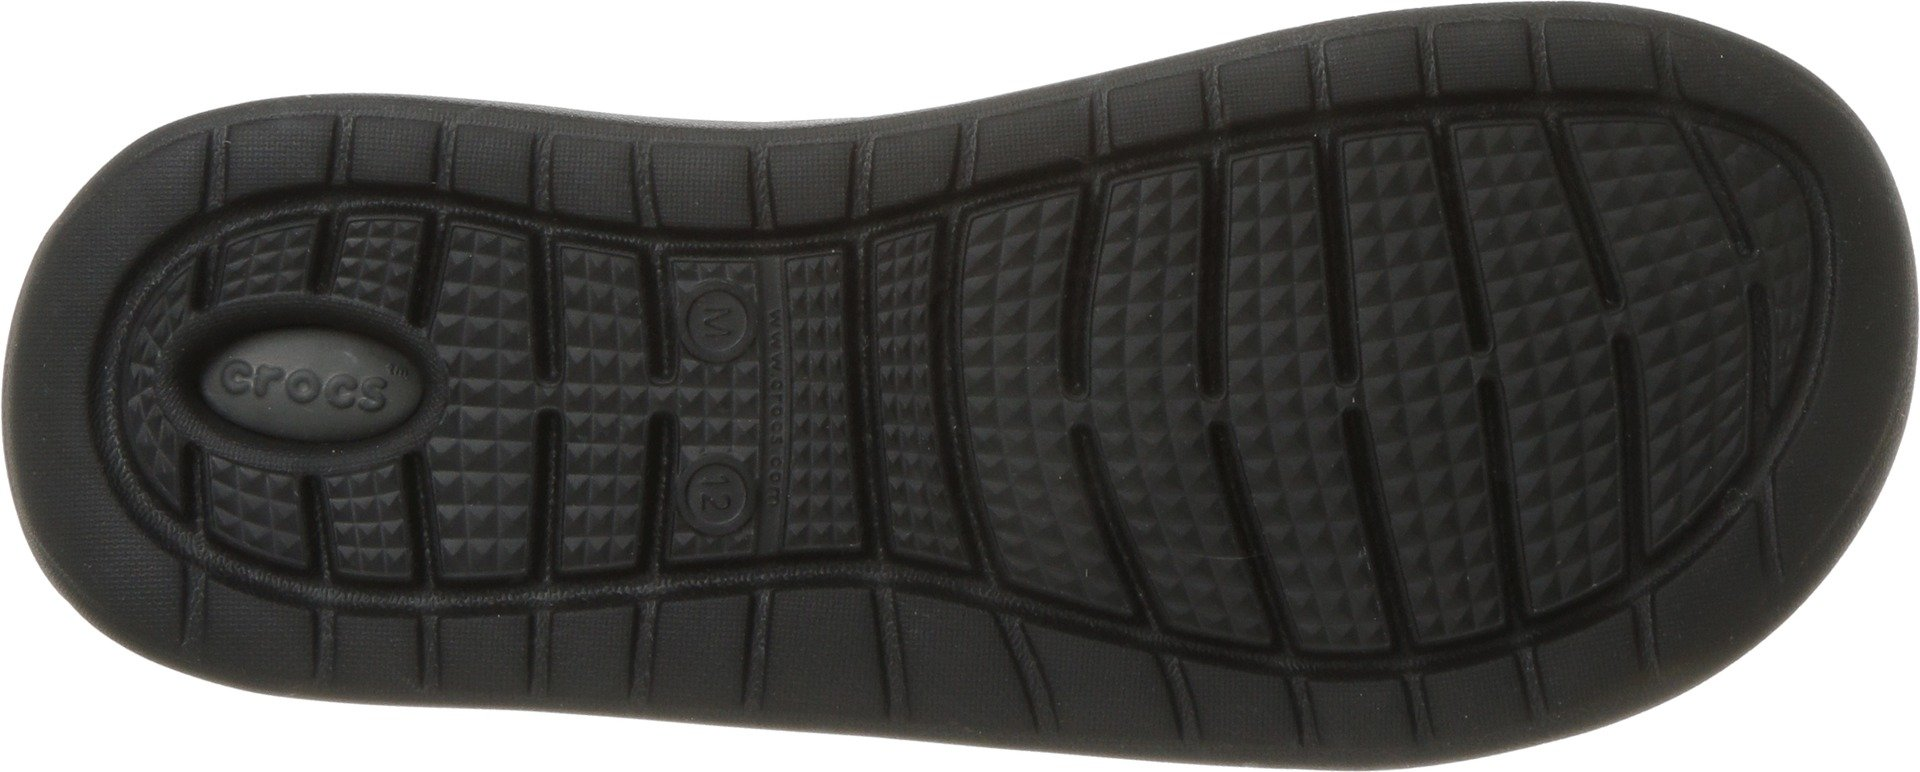 Crocs Unisex-Adults Literide Slide Sandal, Black/Slate Grey, 10 US Men/12 US Women by Crocs (Image #3)